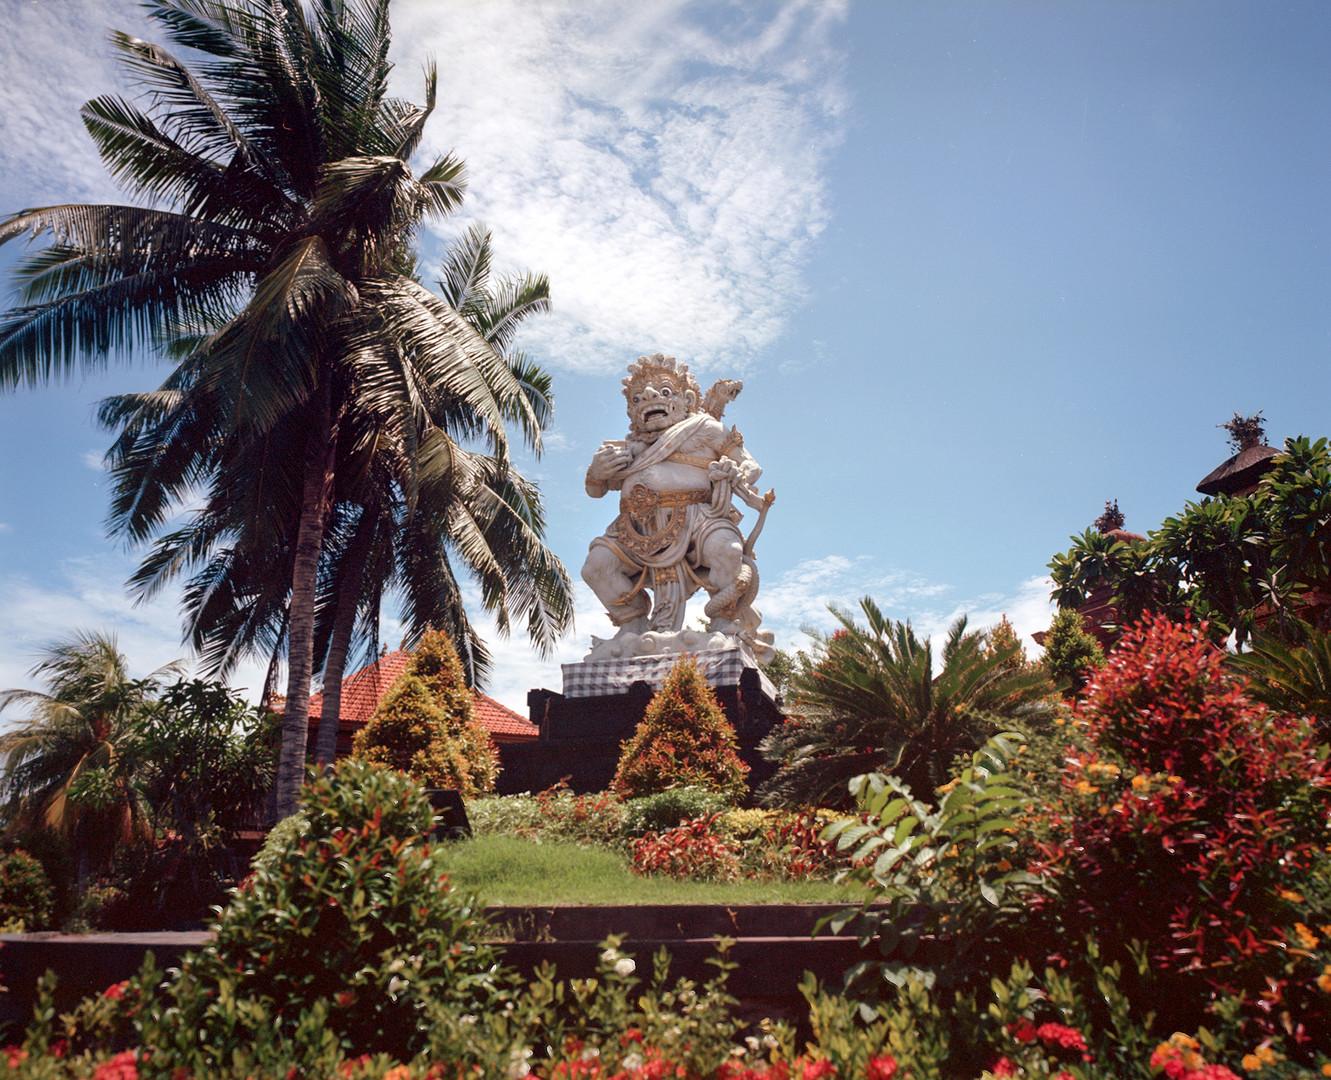 Goodman-zone-camera-shots-Bali-6.jpg